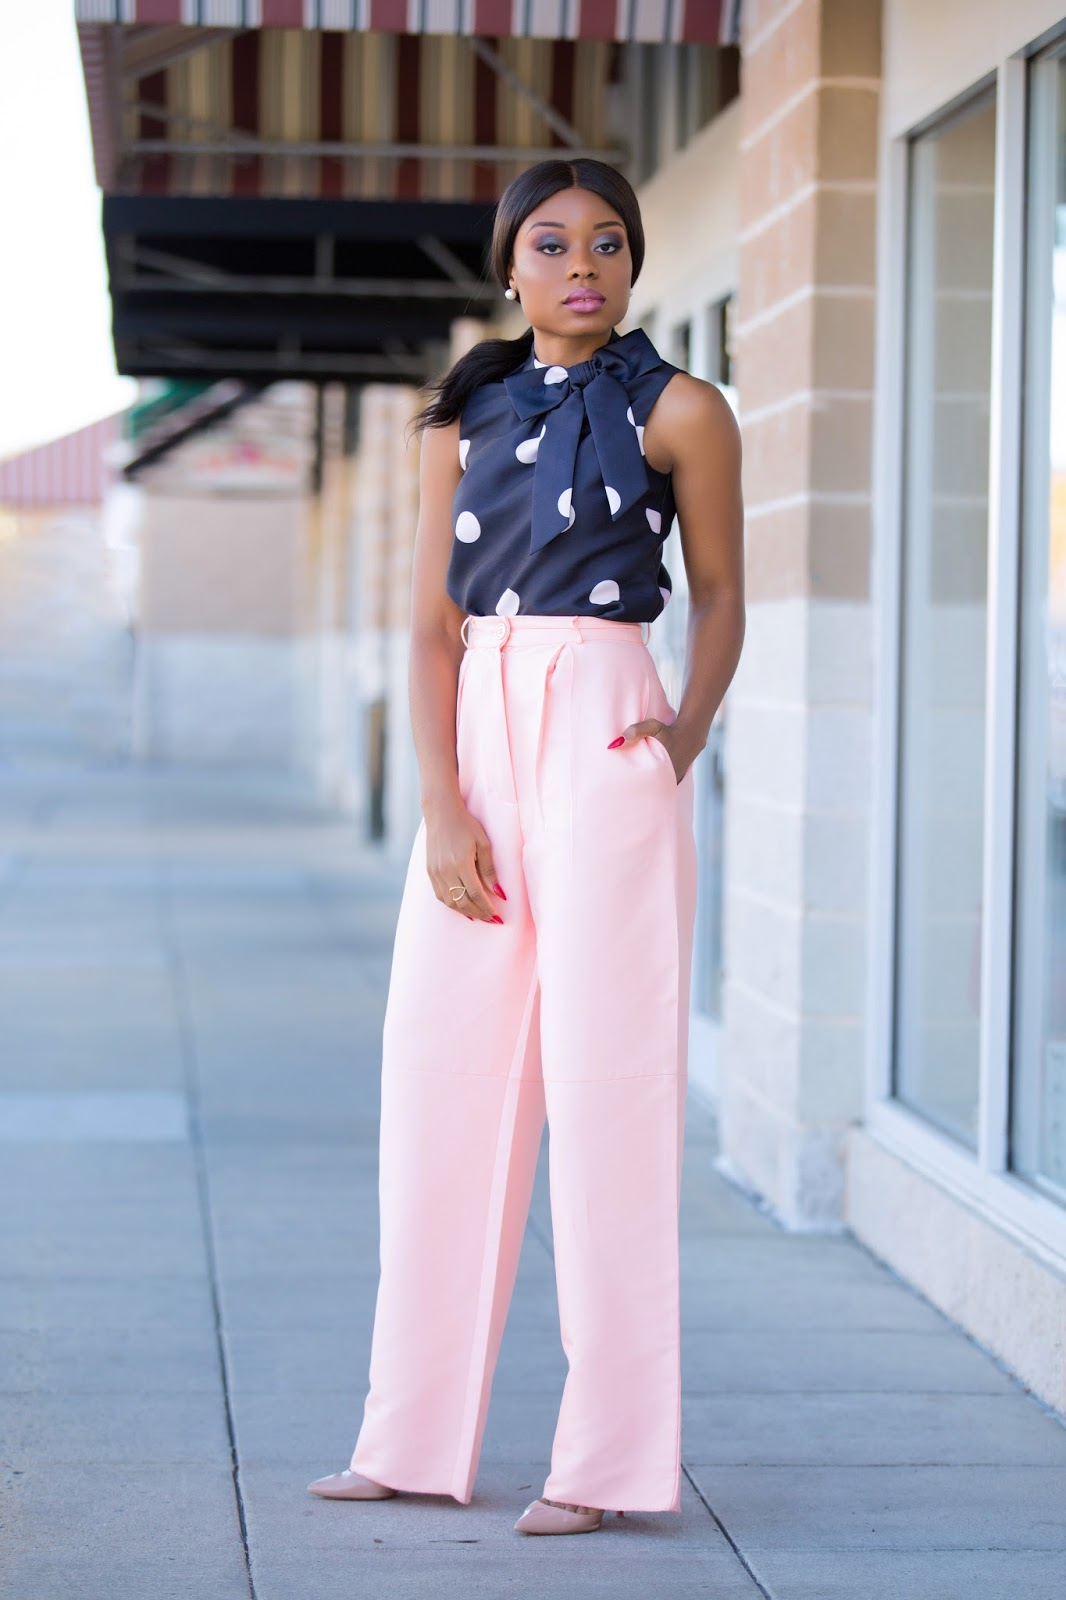 Blush tones and polka dot, www.jadore-fashion.com